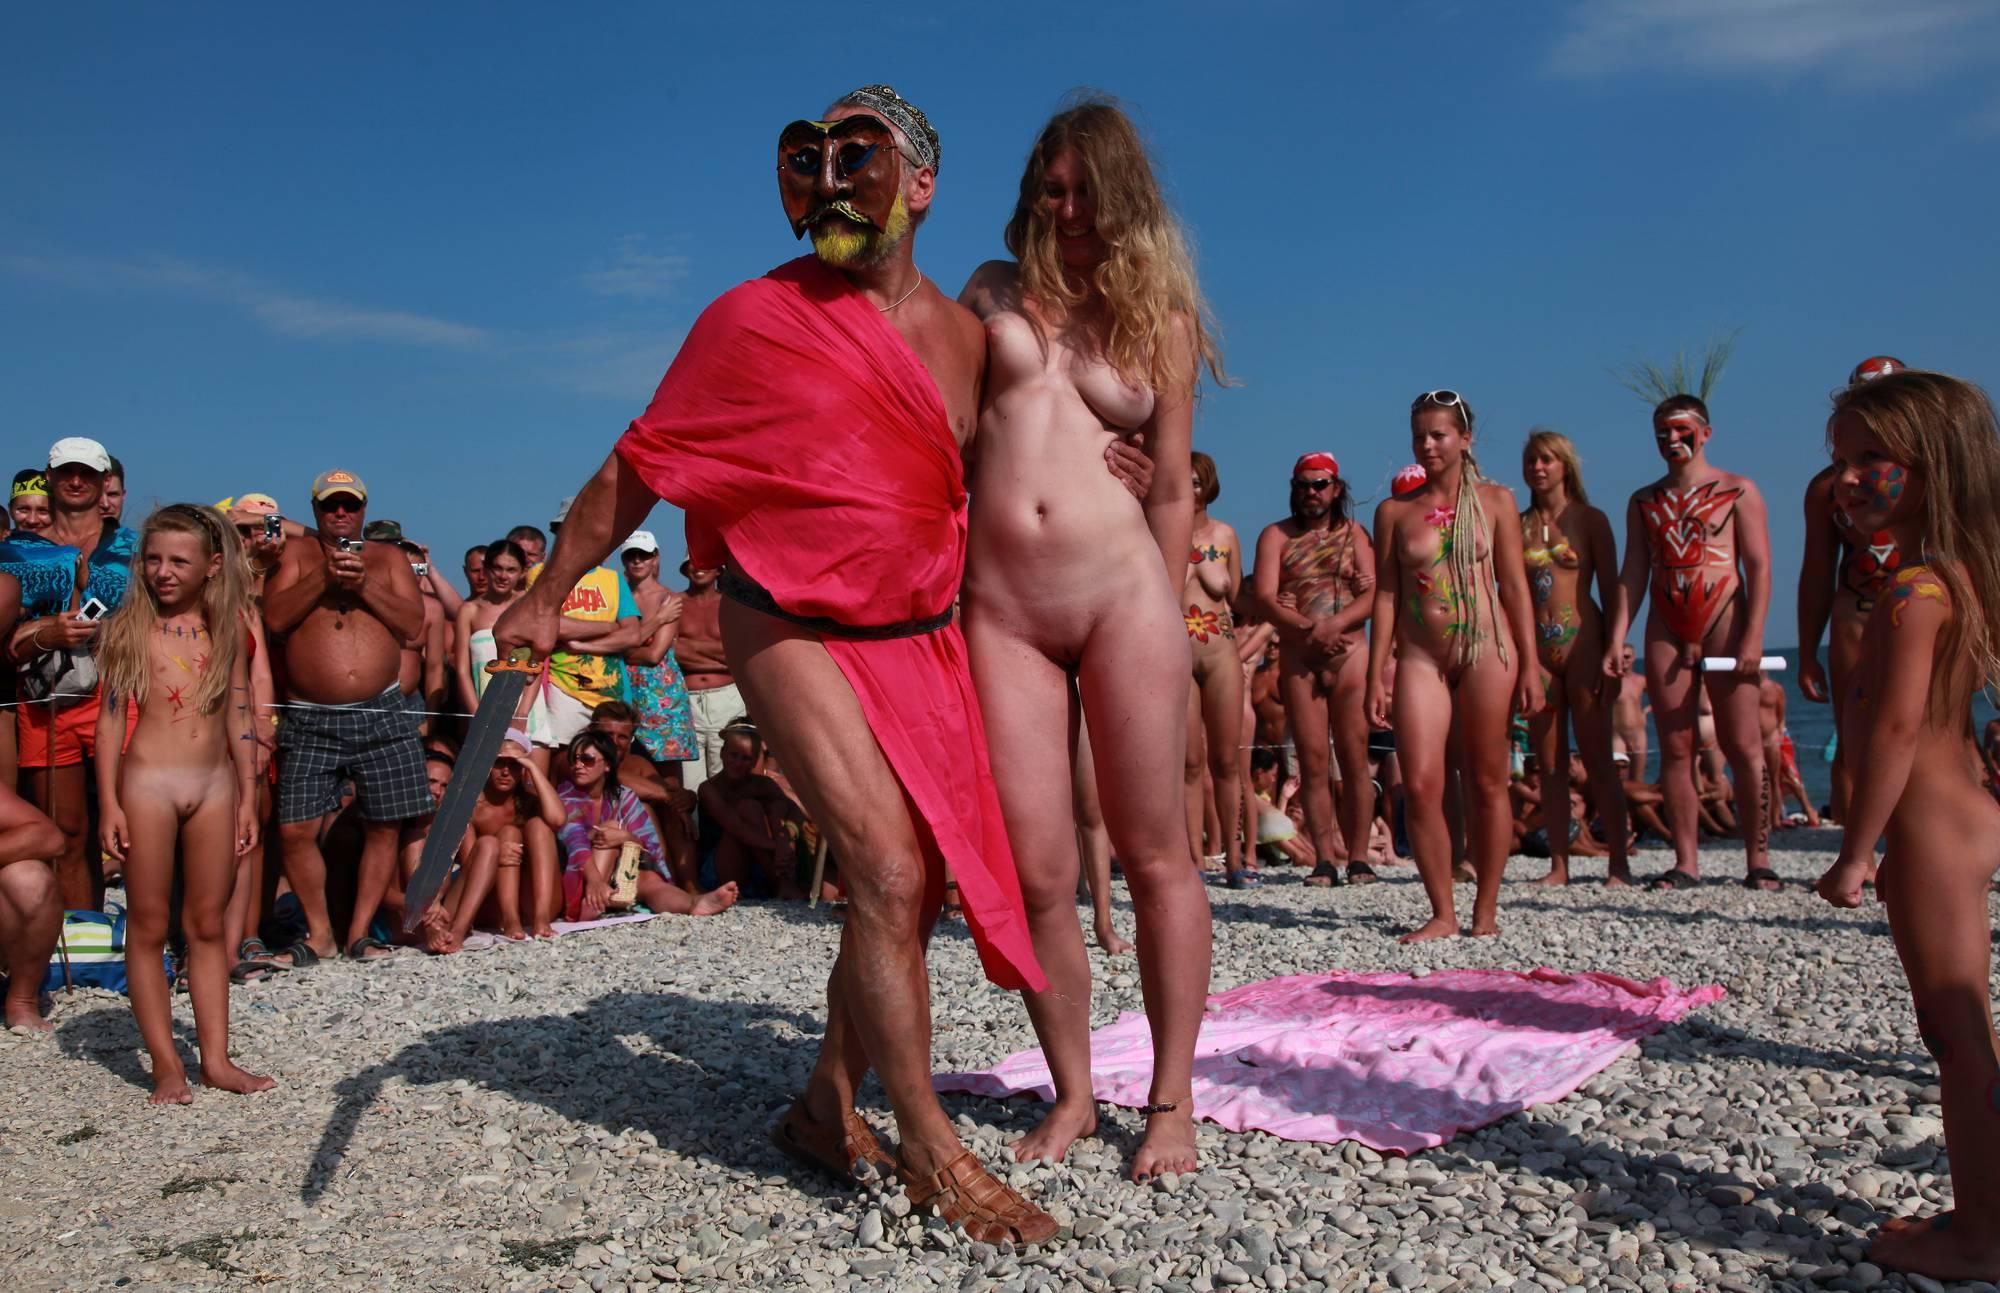 Nudist Gallery Neptune Couple Grouping - 2